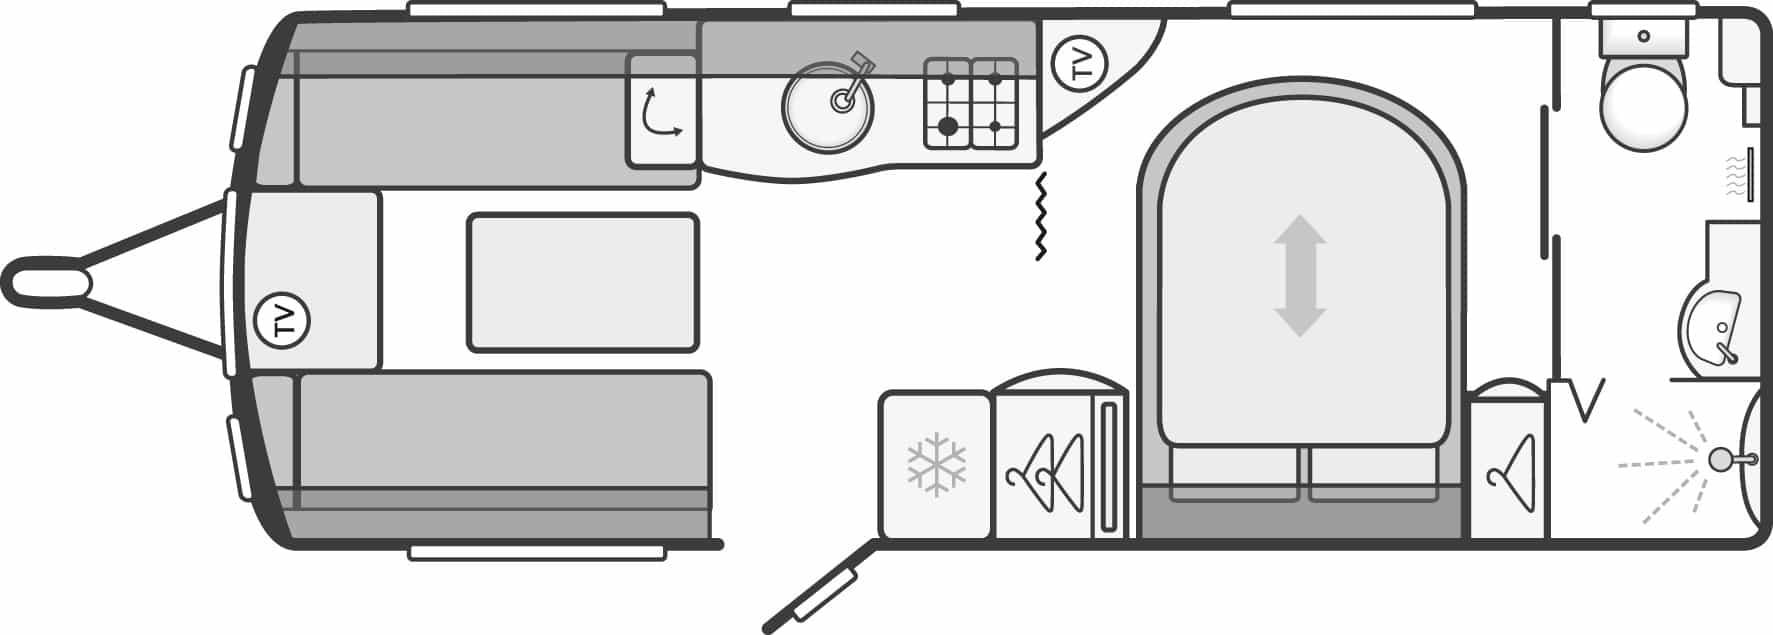 Sterling Elite 580 - 4 Berth, Transverse Fixed Bed, End Washroom